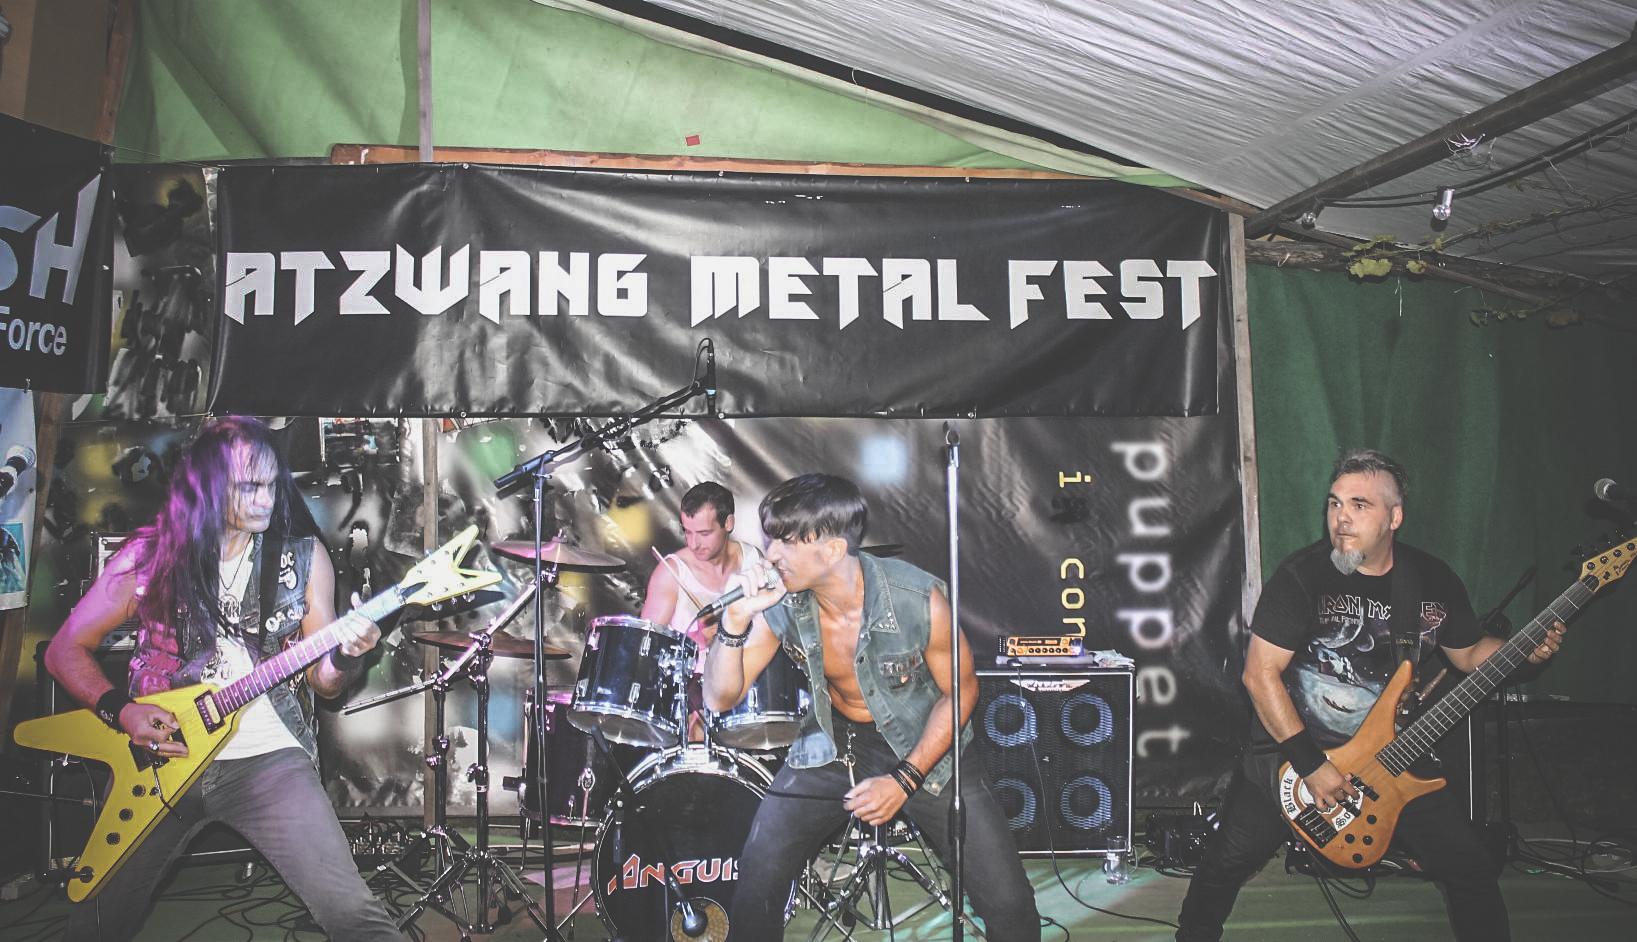 Anguish Force Atzwang Metal Fest 2019 18 - Atzwang Metal Fest 9 - live